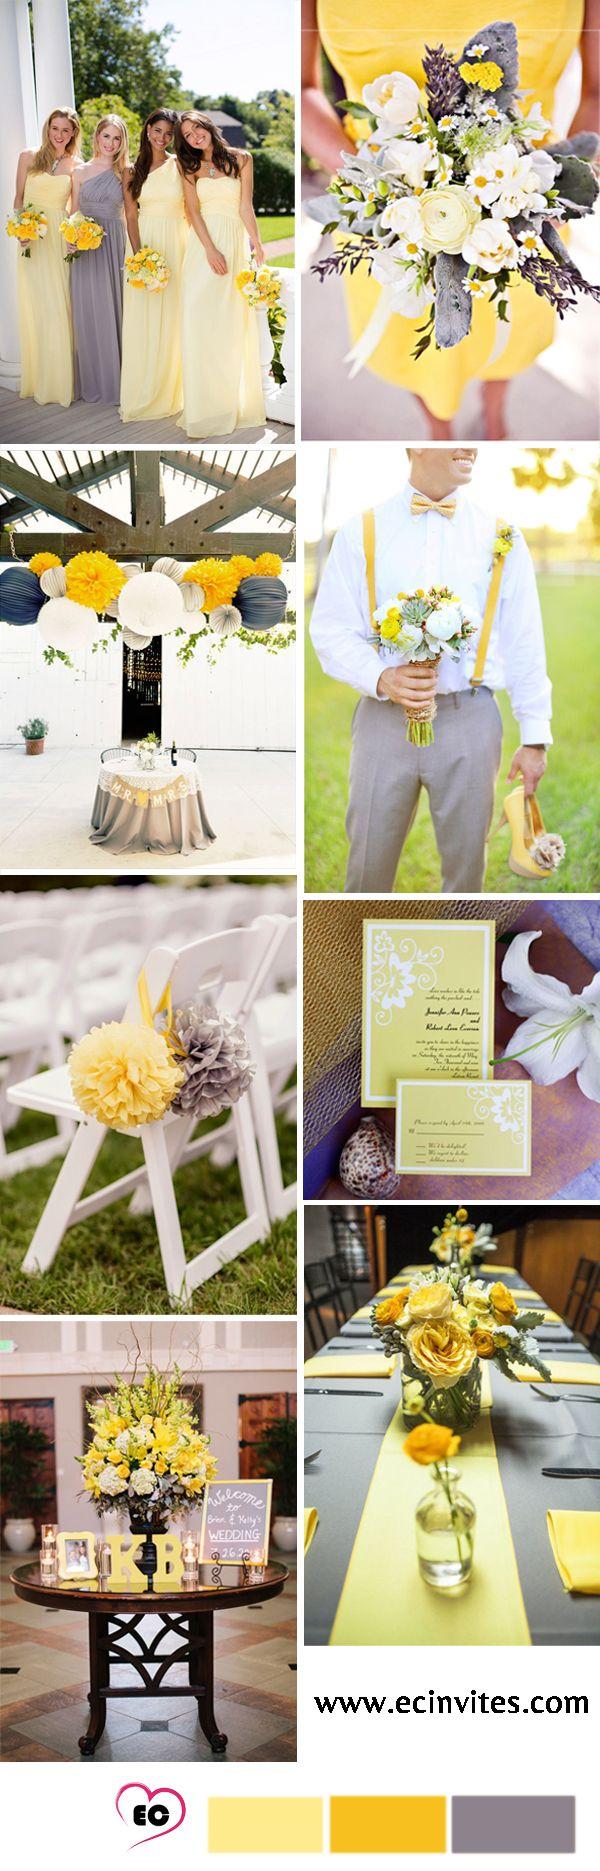 Bright Yellow And Grey Wedding Idea Image Source Diamond Silver Theme